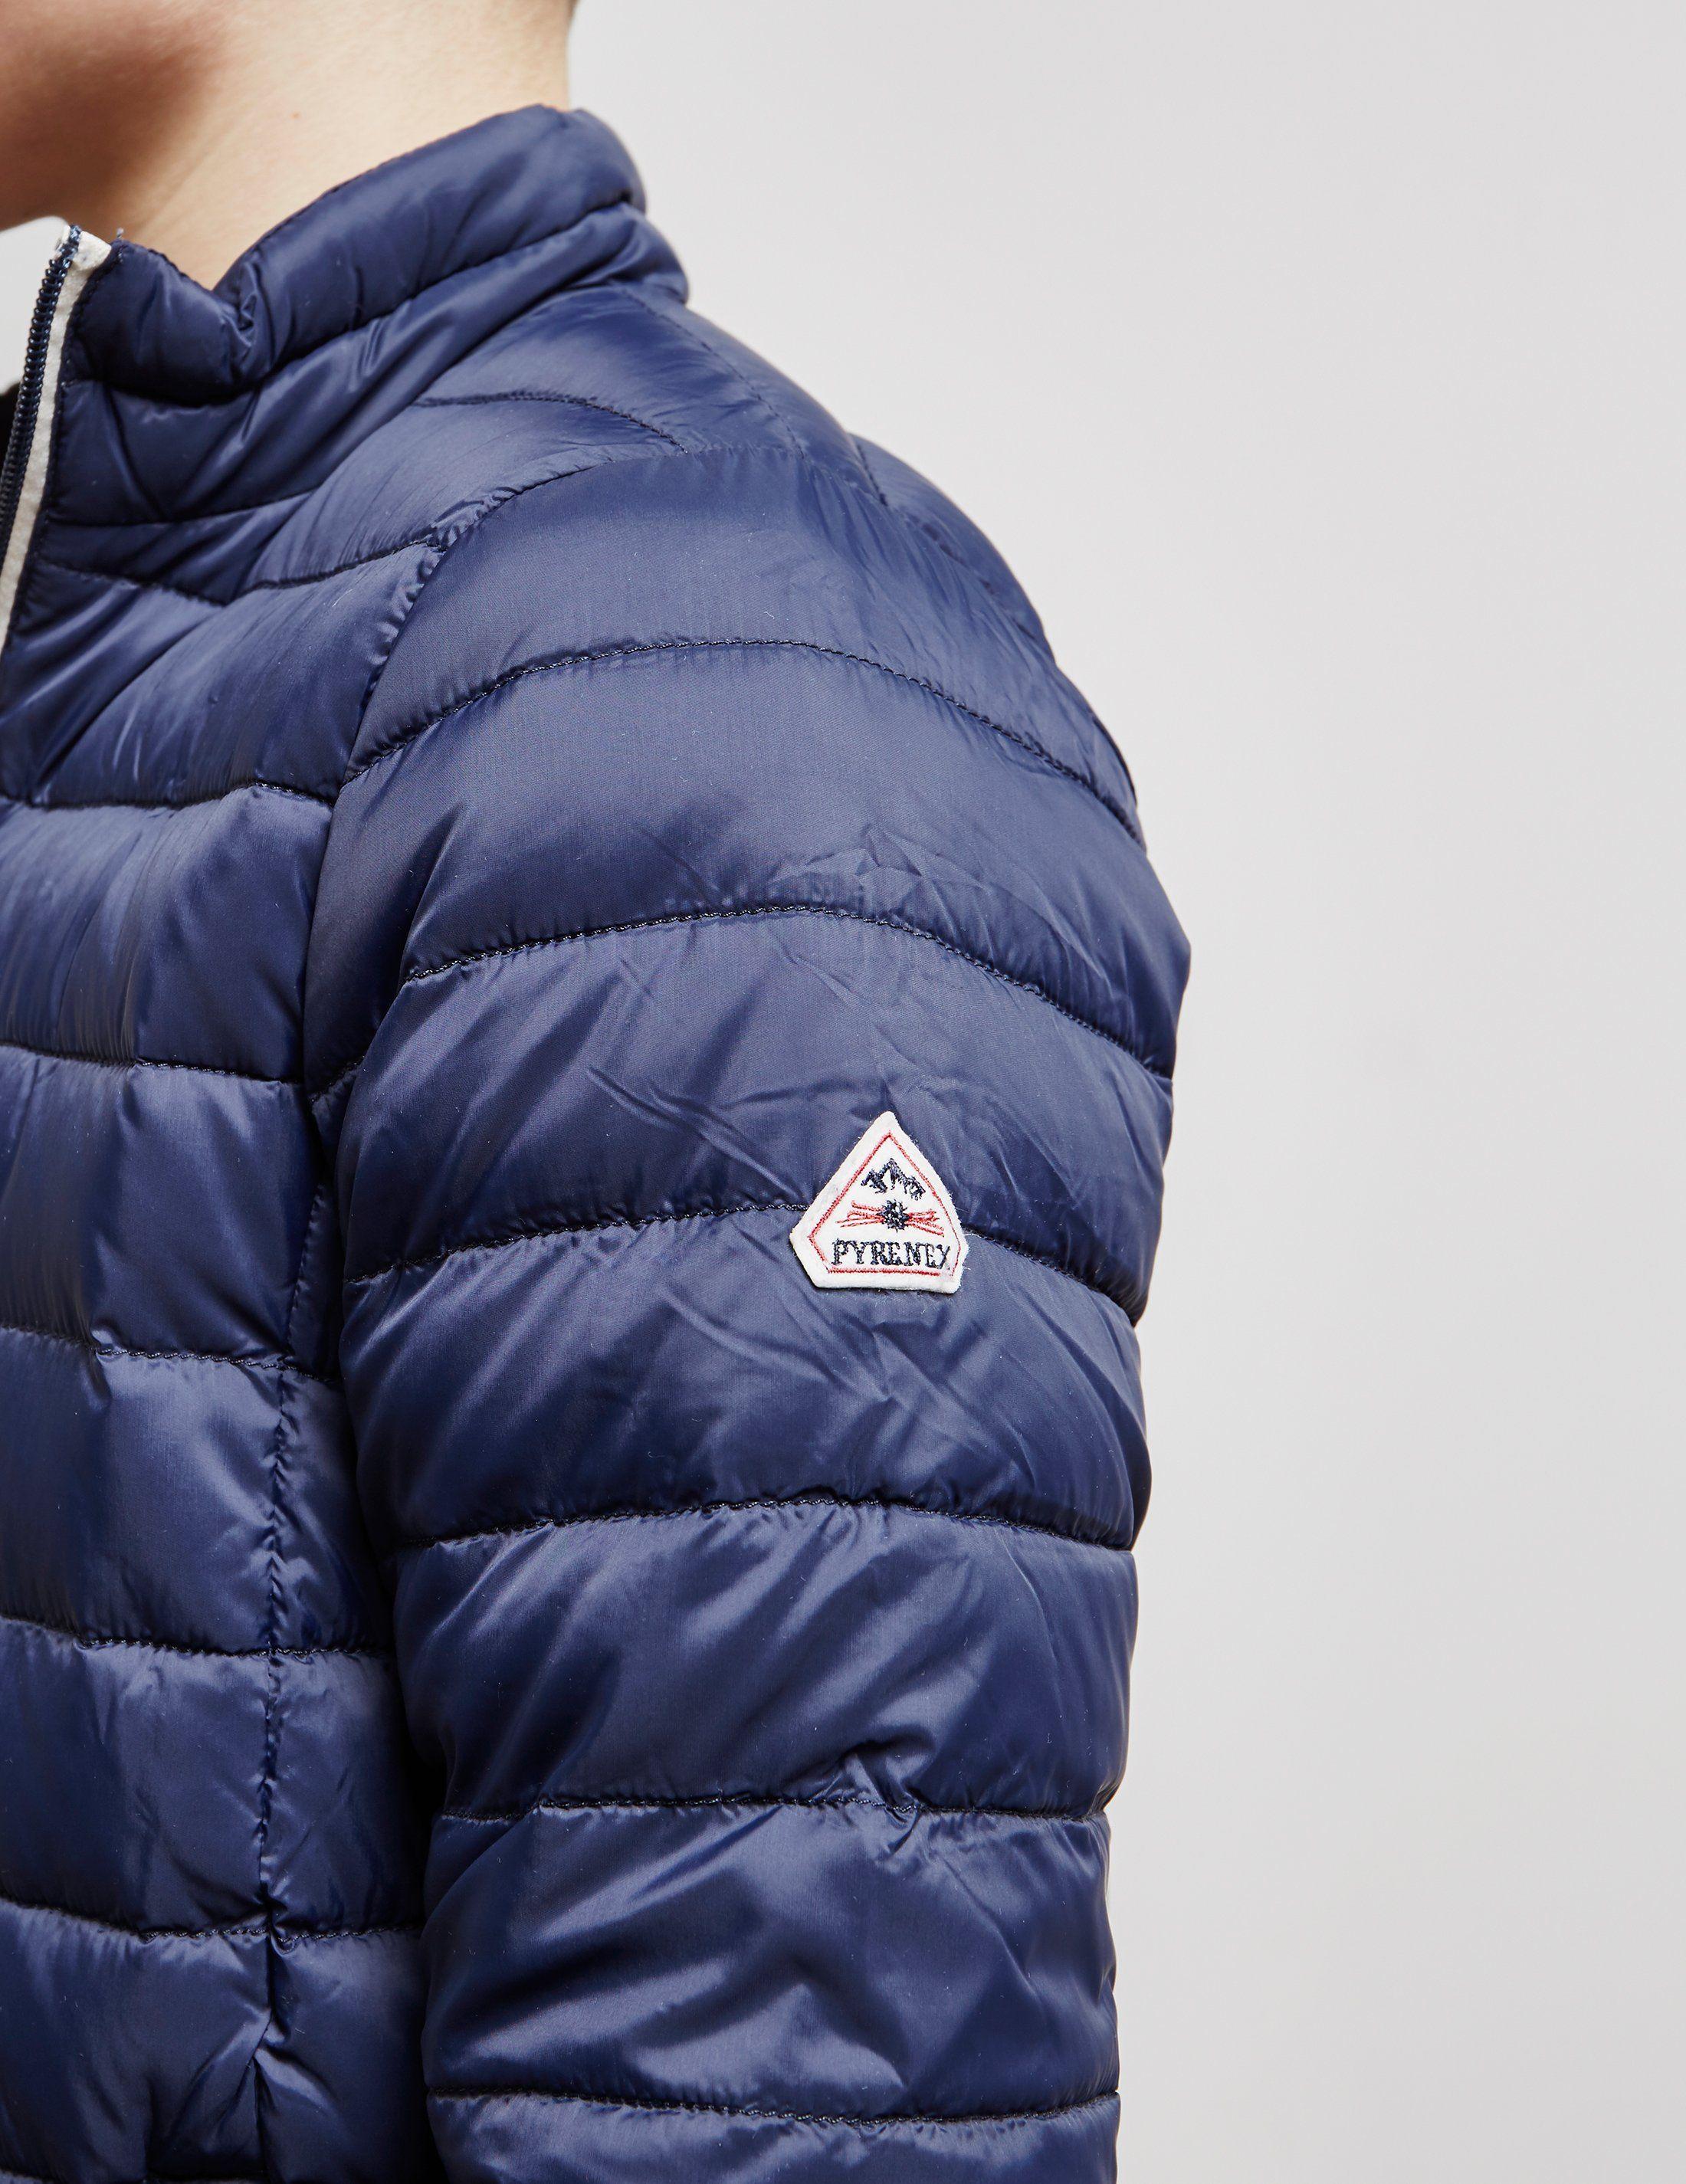 Pyrenex Lightweight Quilted Jacket